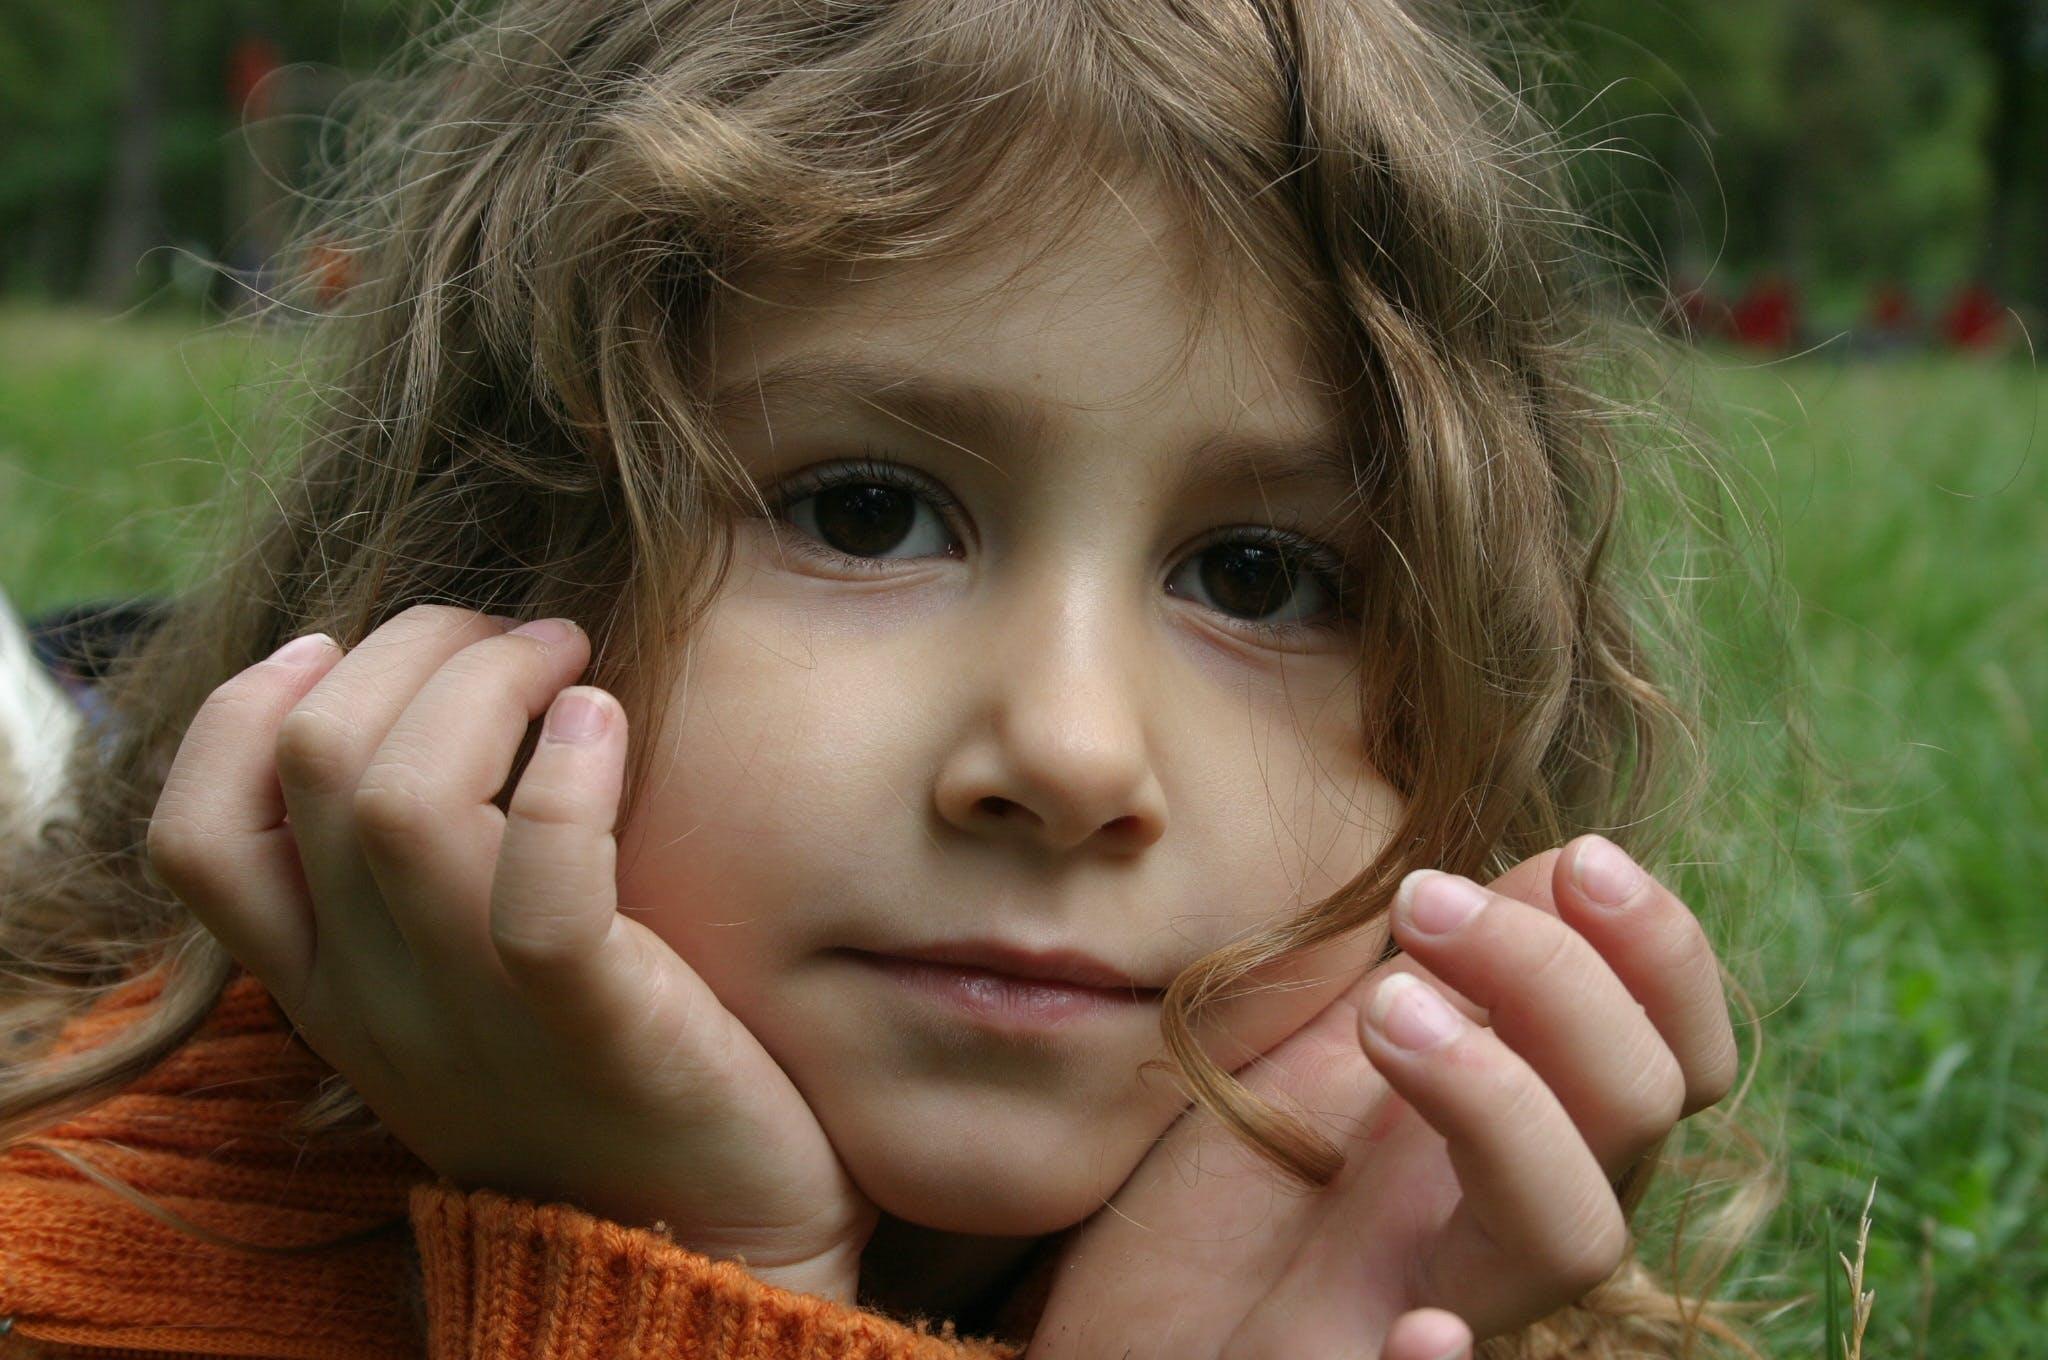 Free stock photo of girl, child, kid, facial